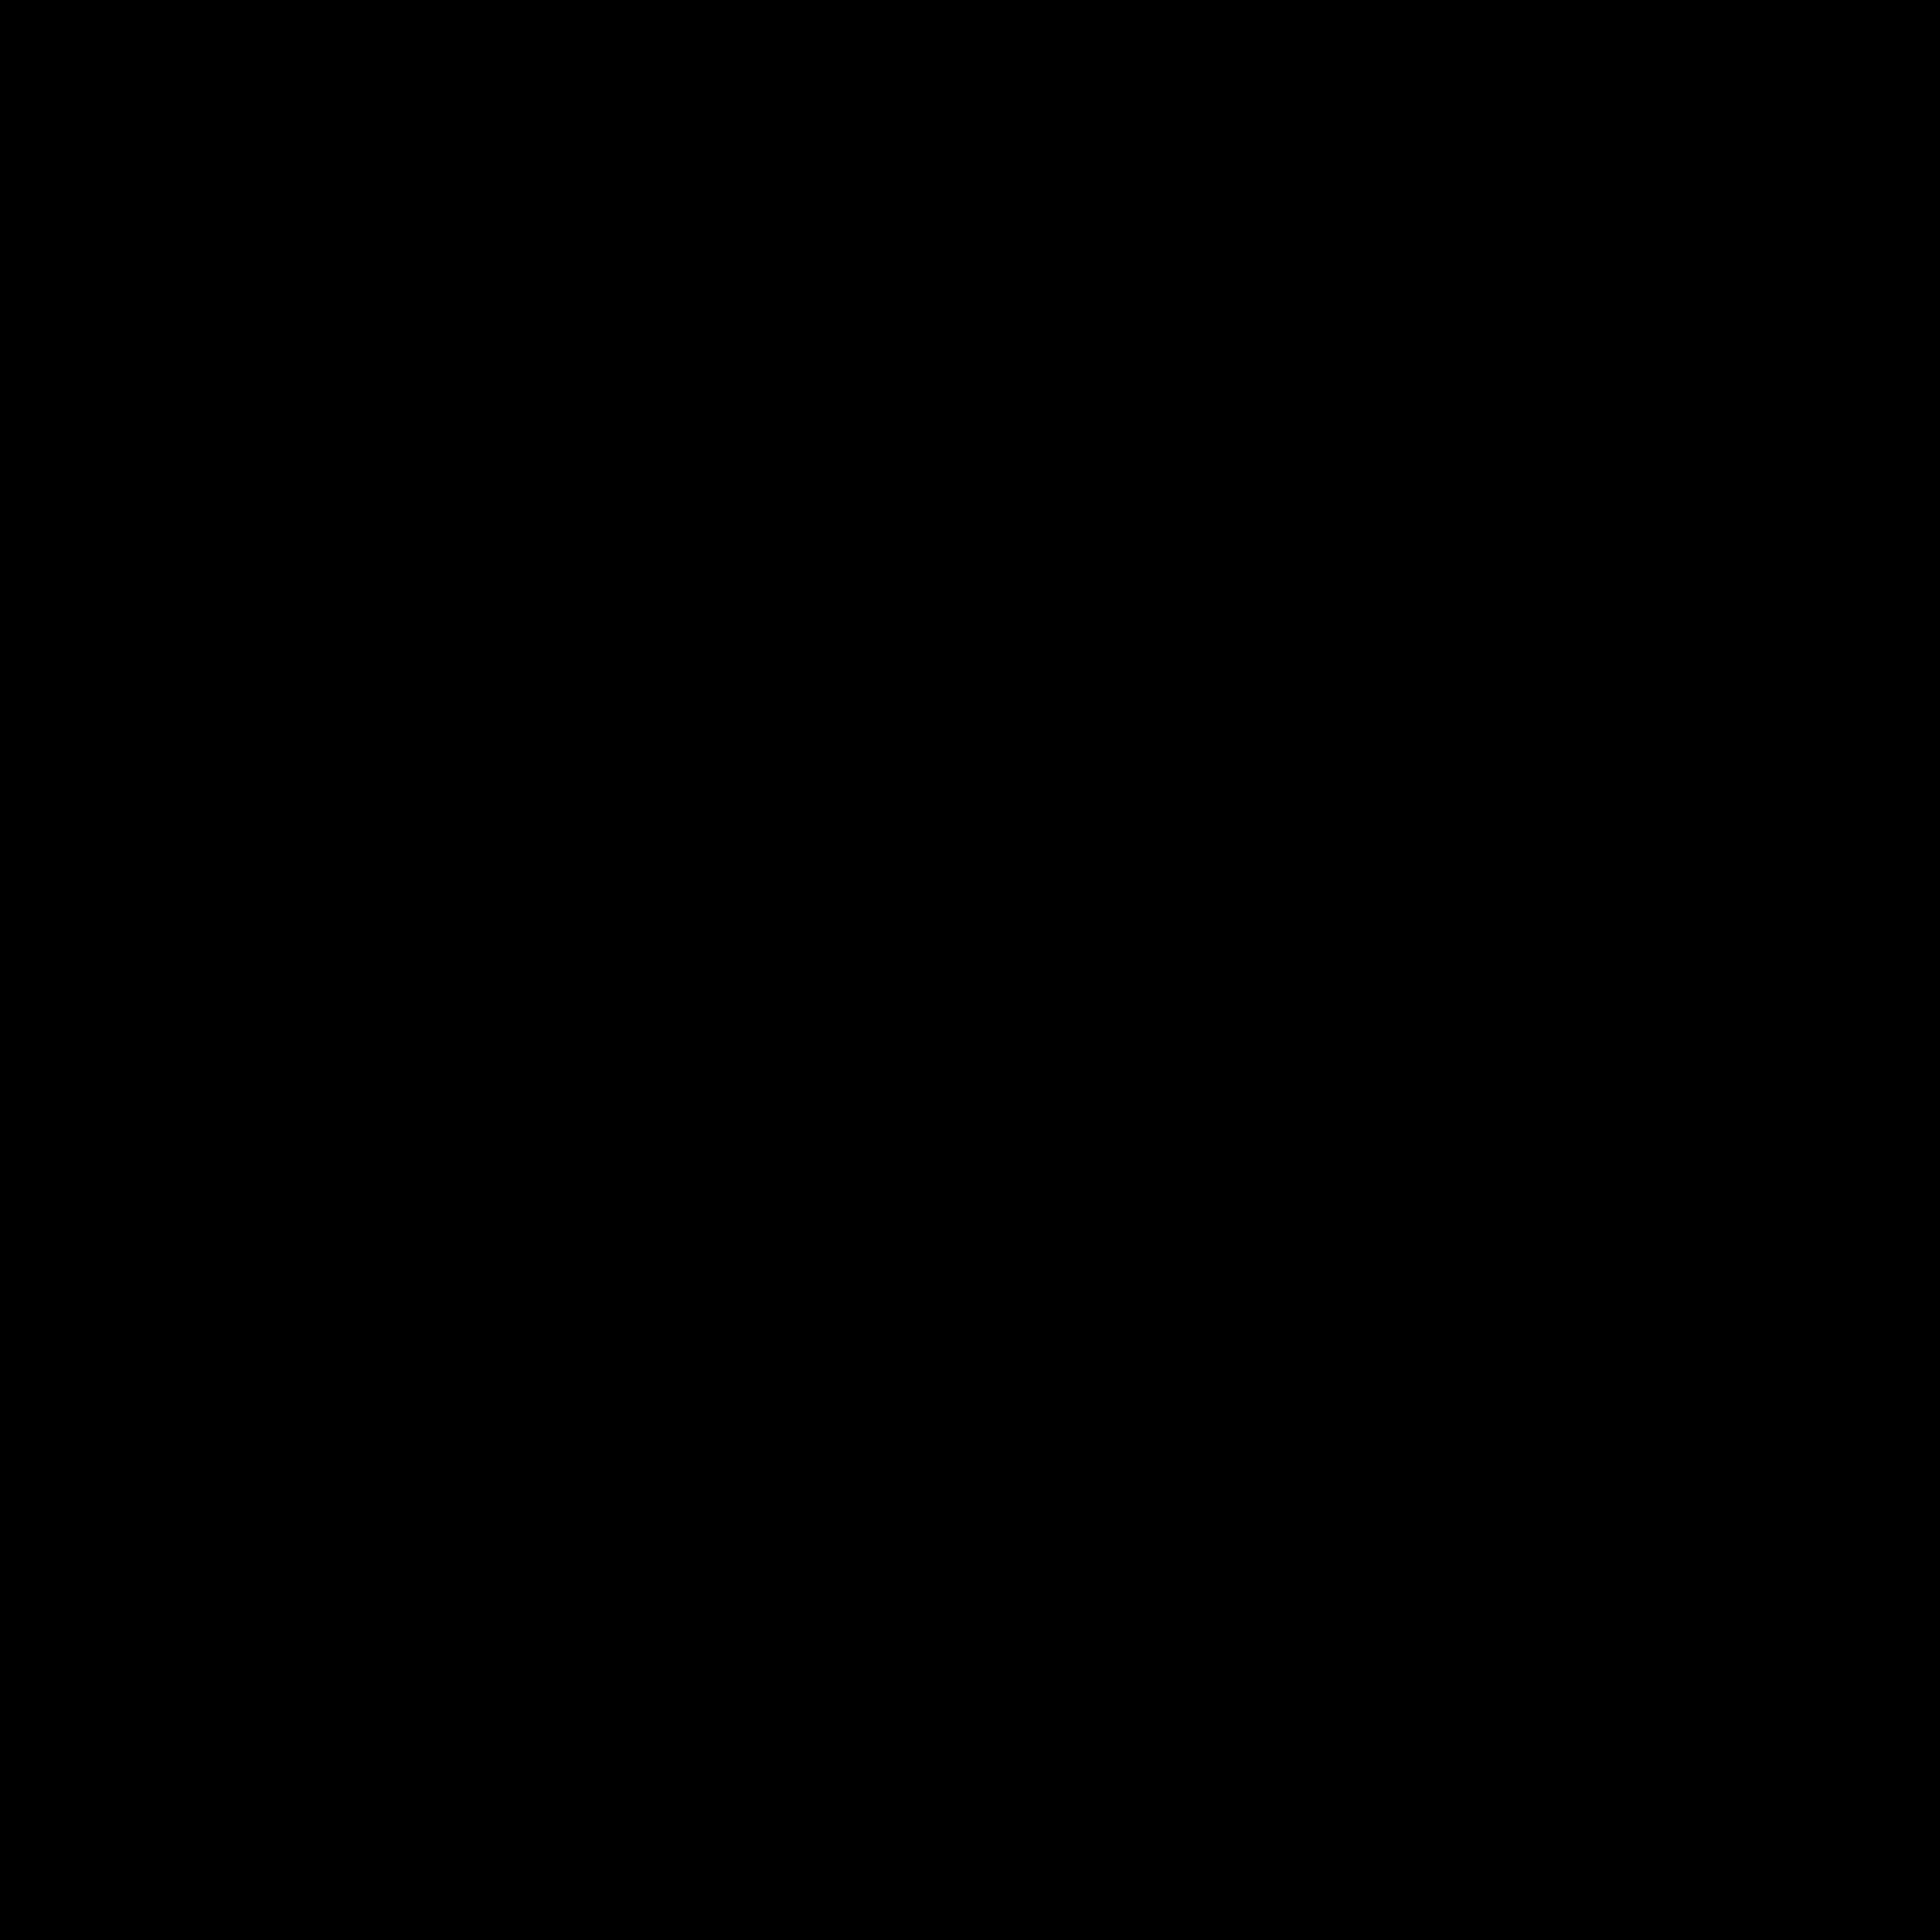 Triangular clipart pyramid. Prism shape clip art